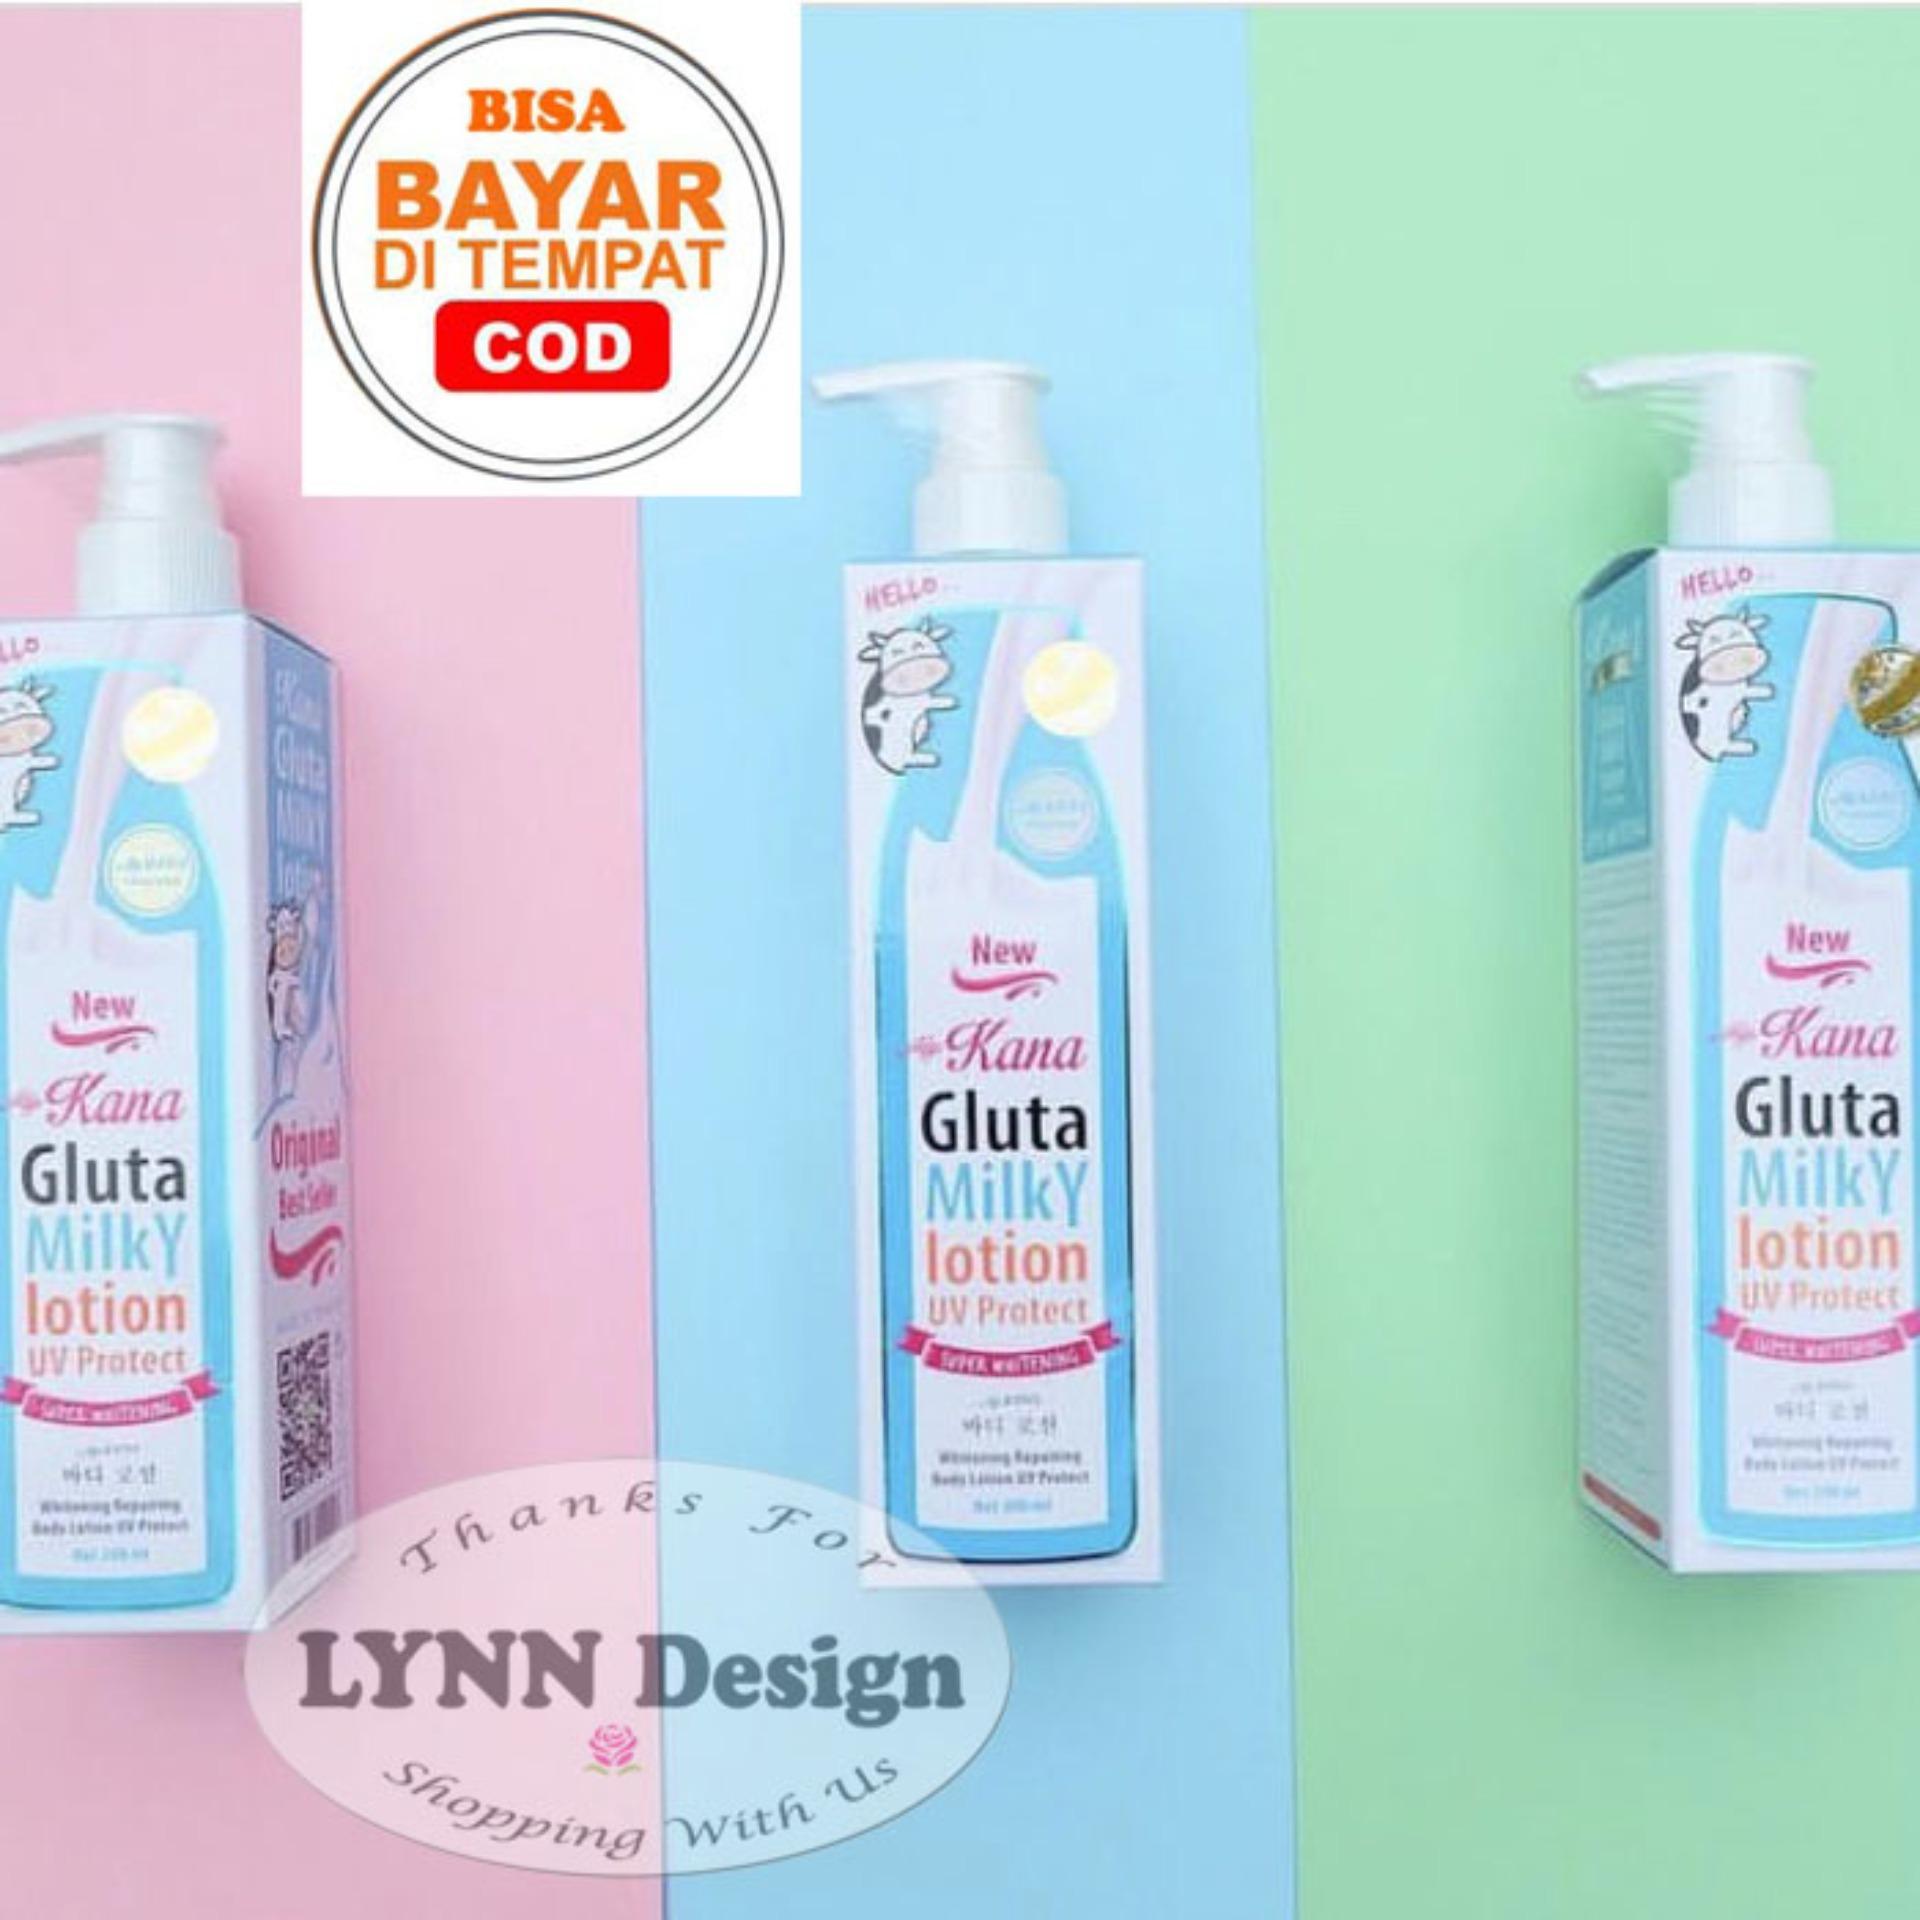 gluta milky lotion by kana original